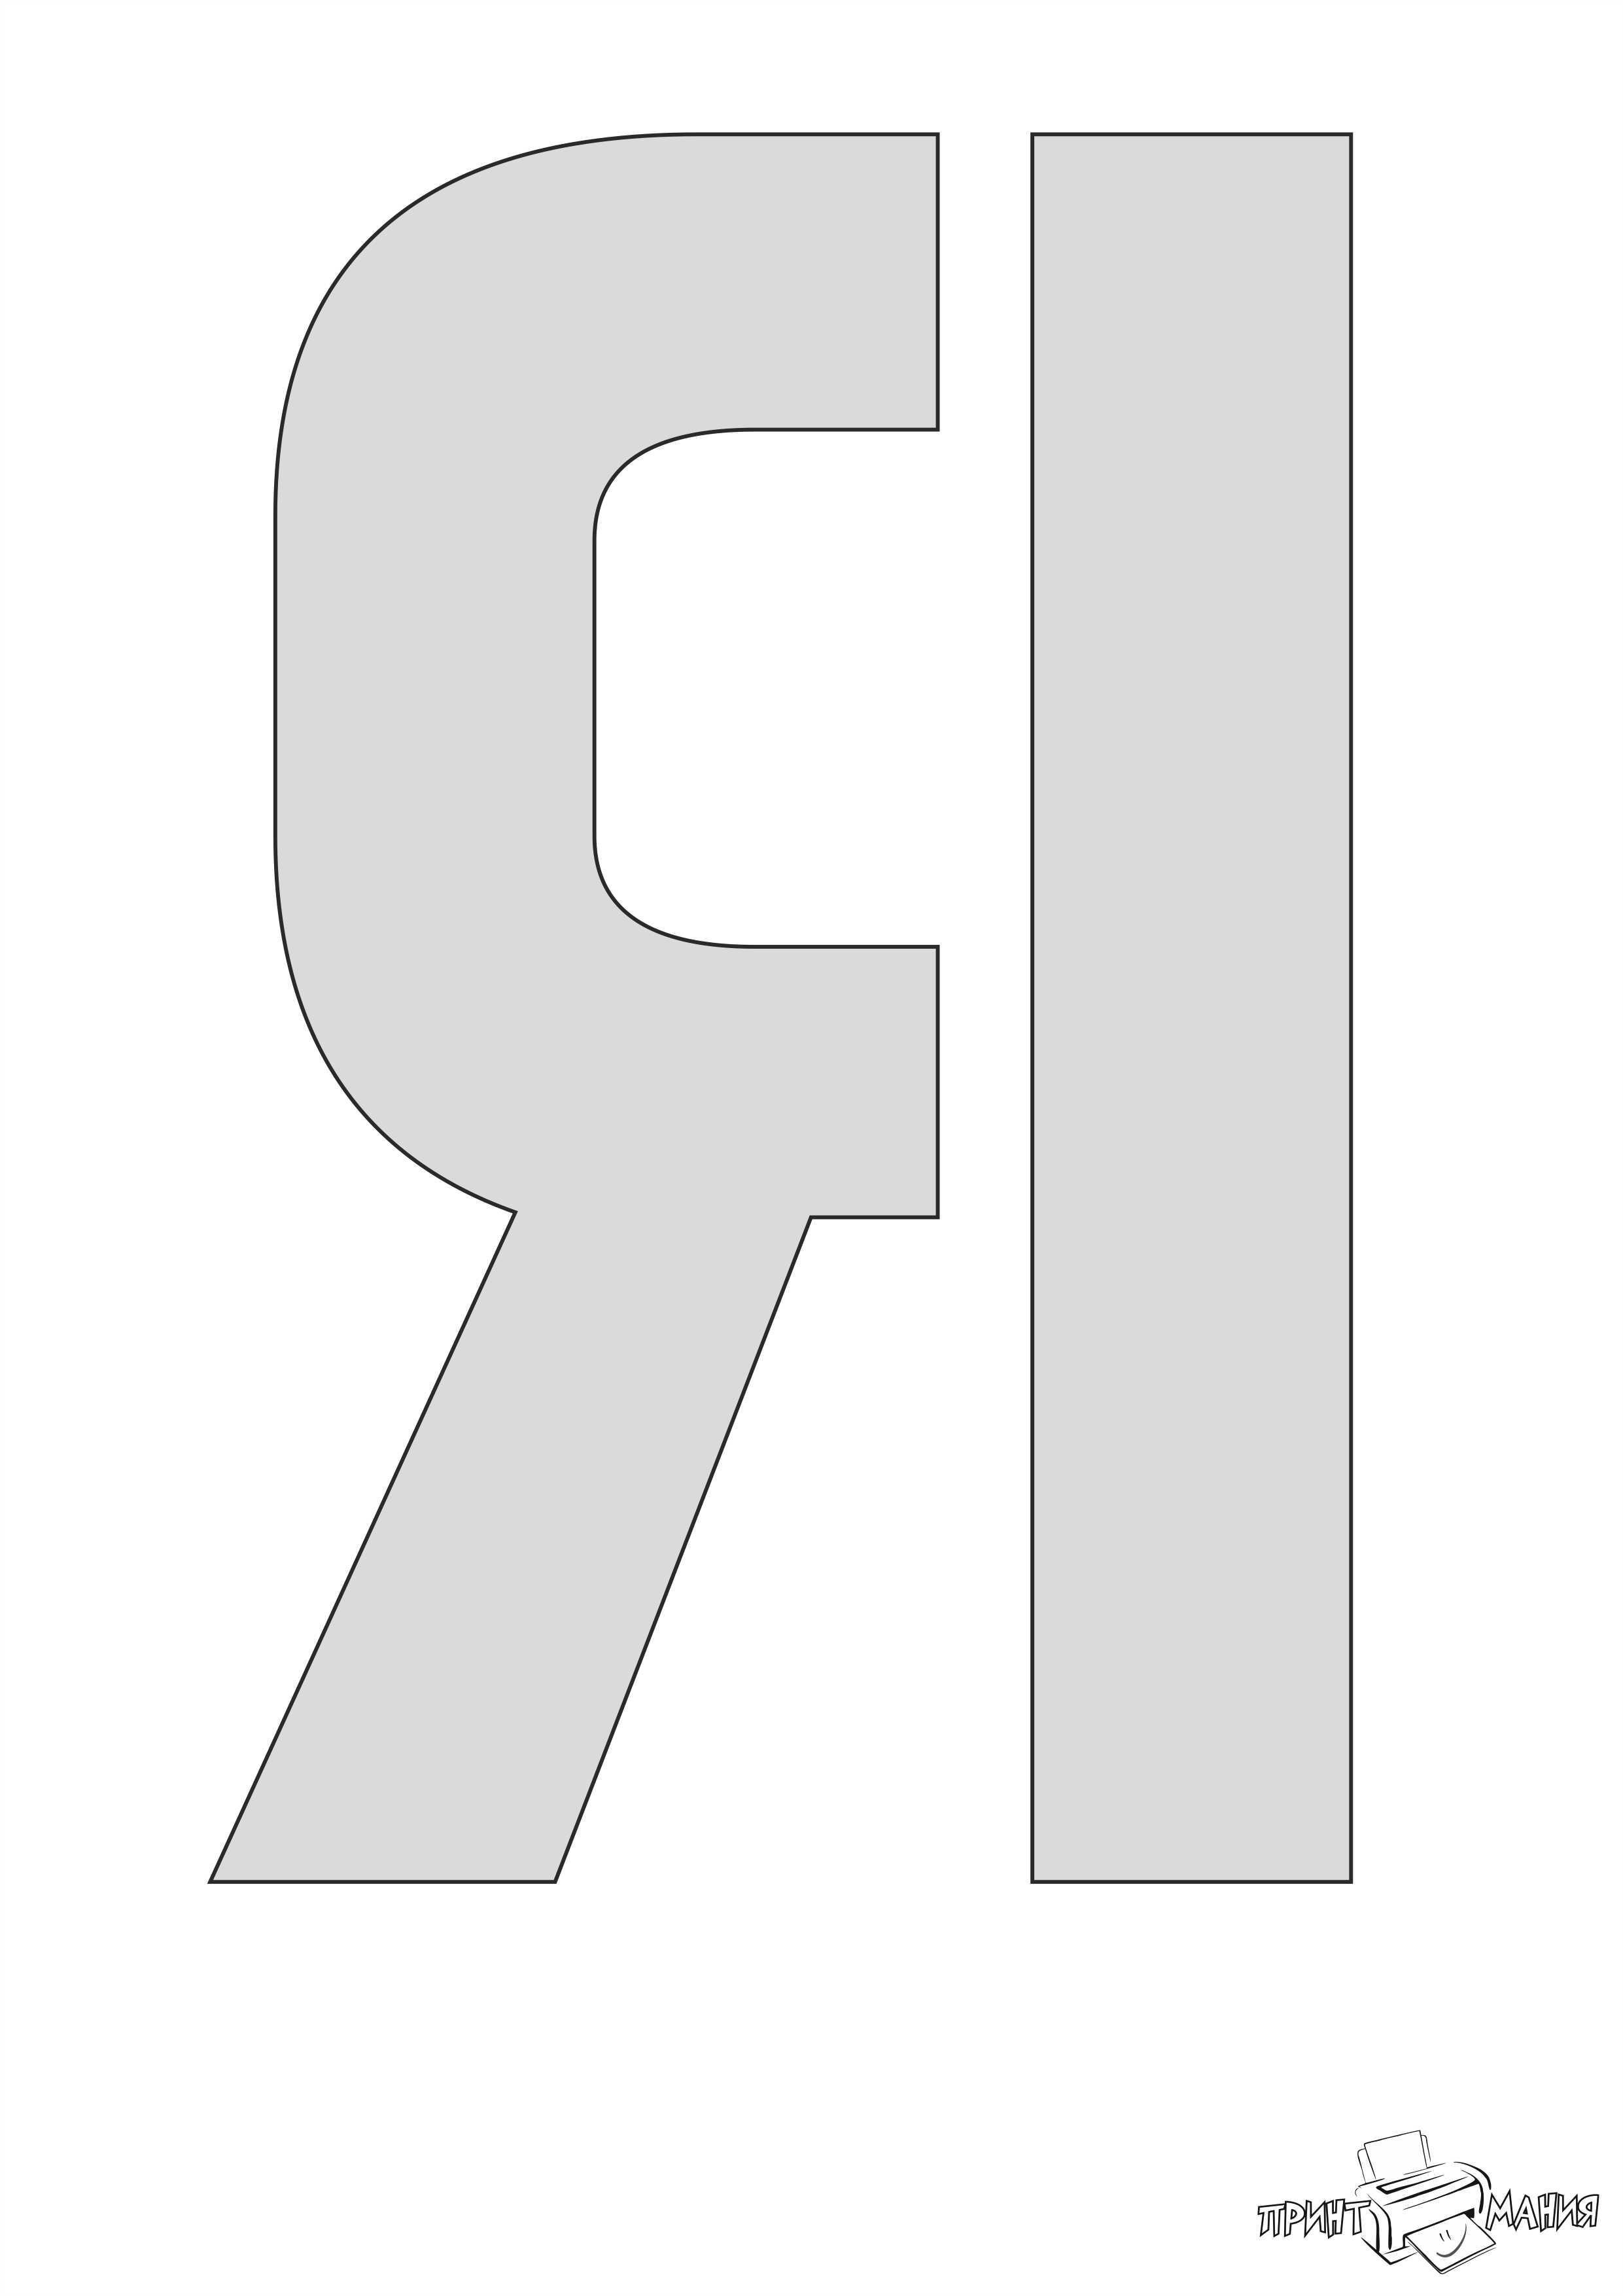 Букв сделать онлайн трафарет Трафареты букв